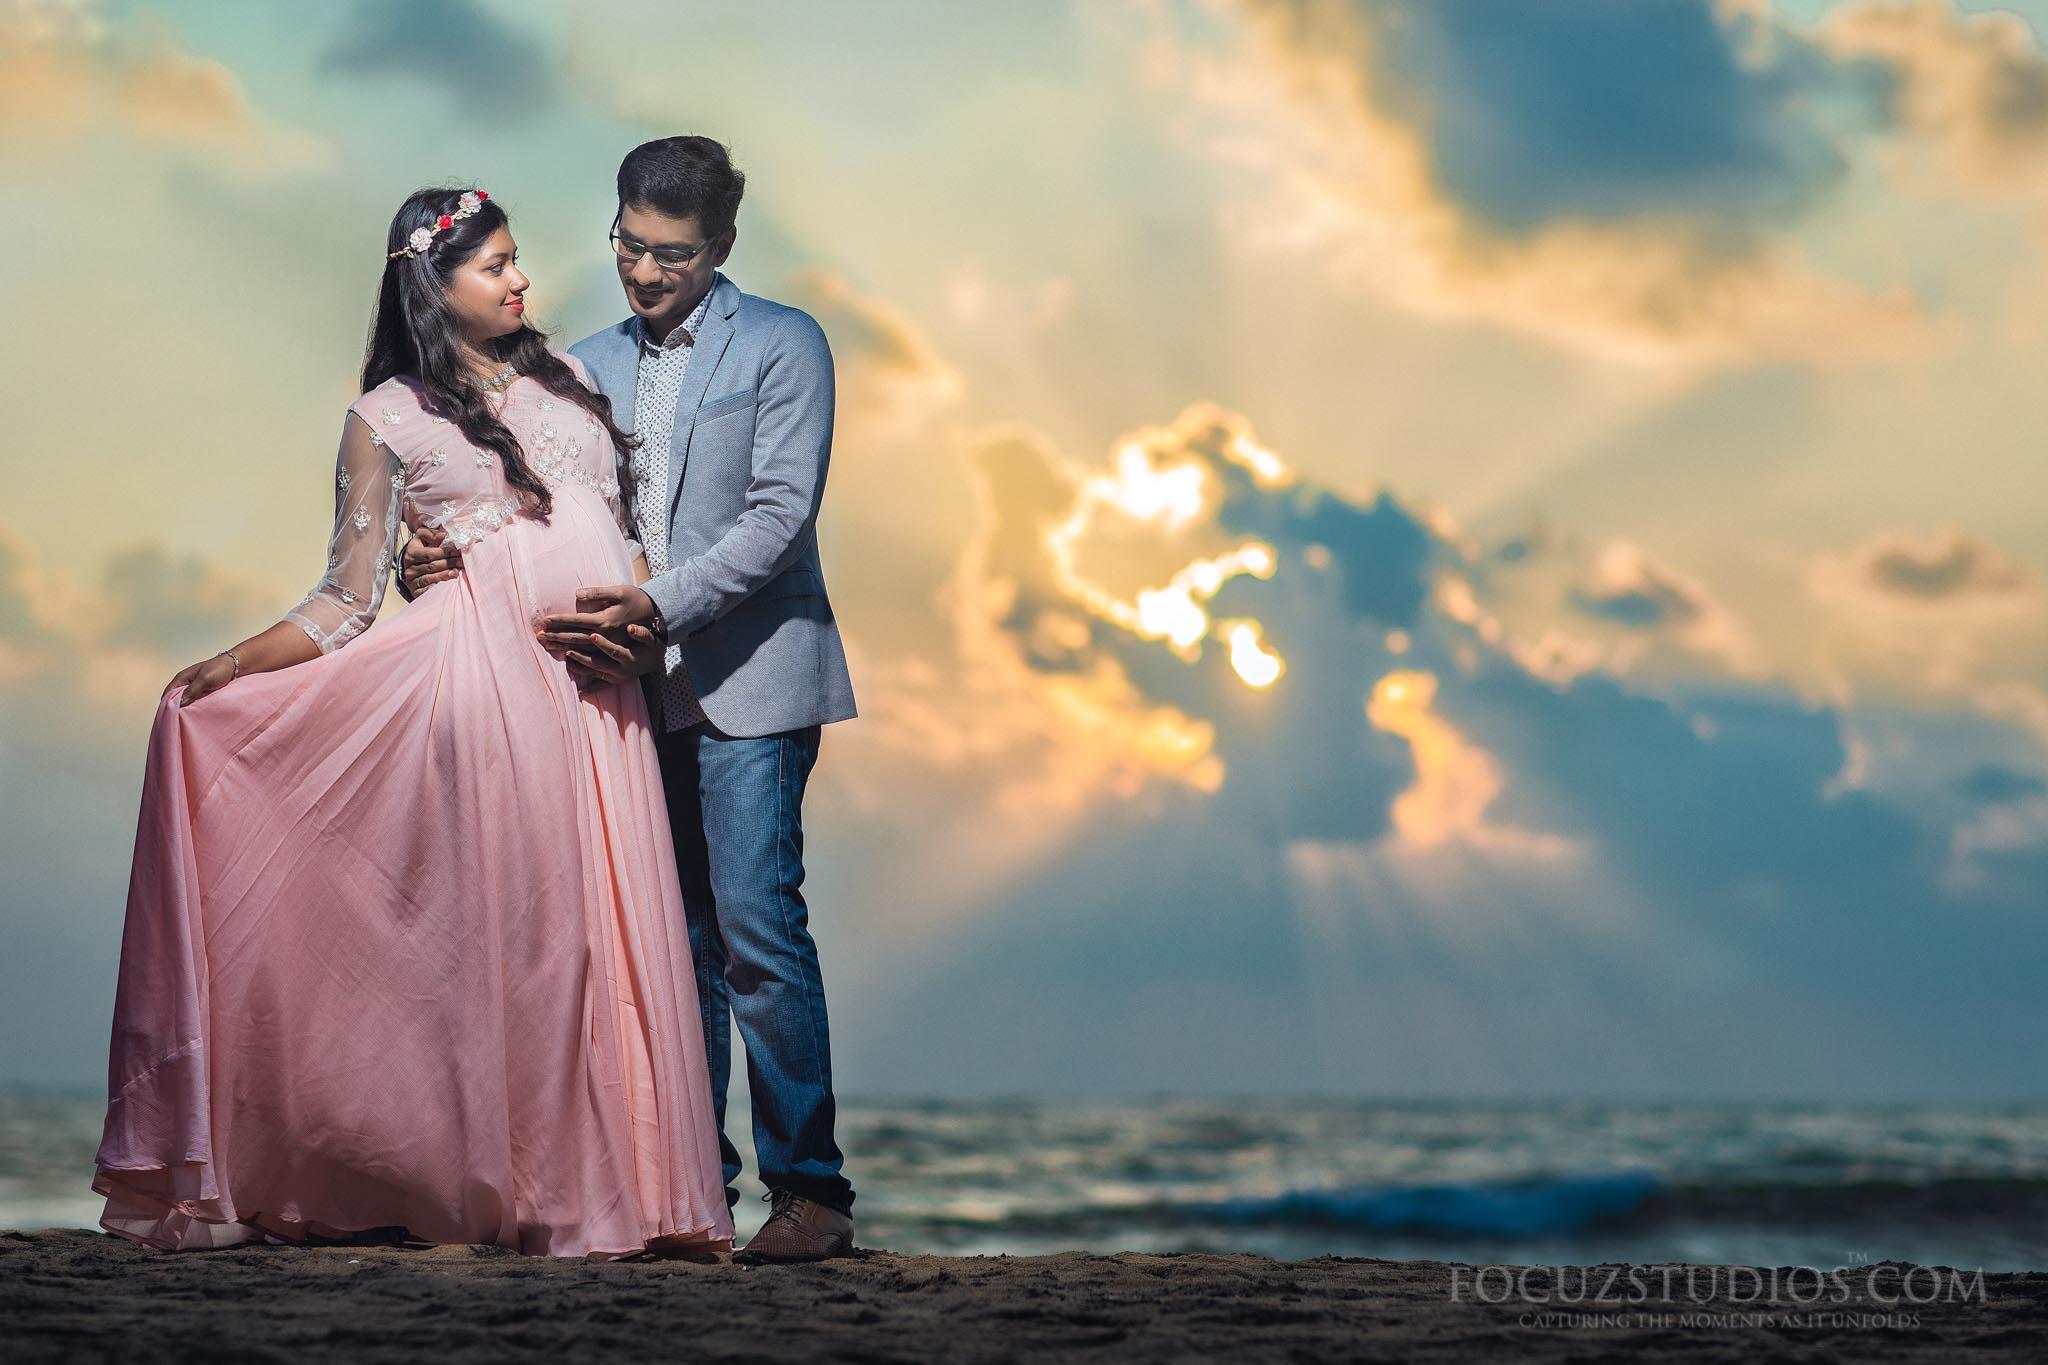 maternity-photoshoot-chennai-focuz-studios-2